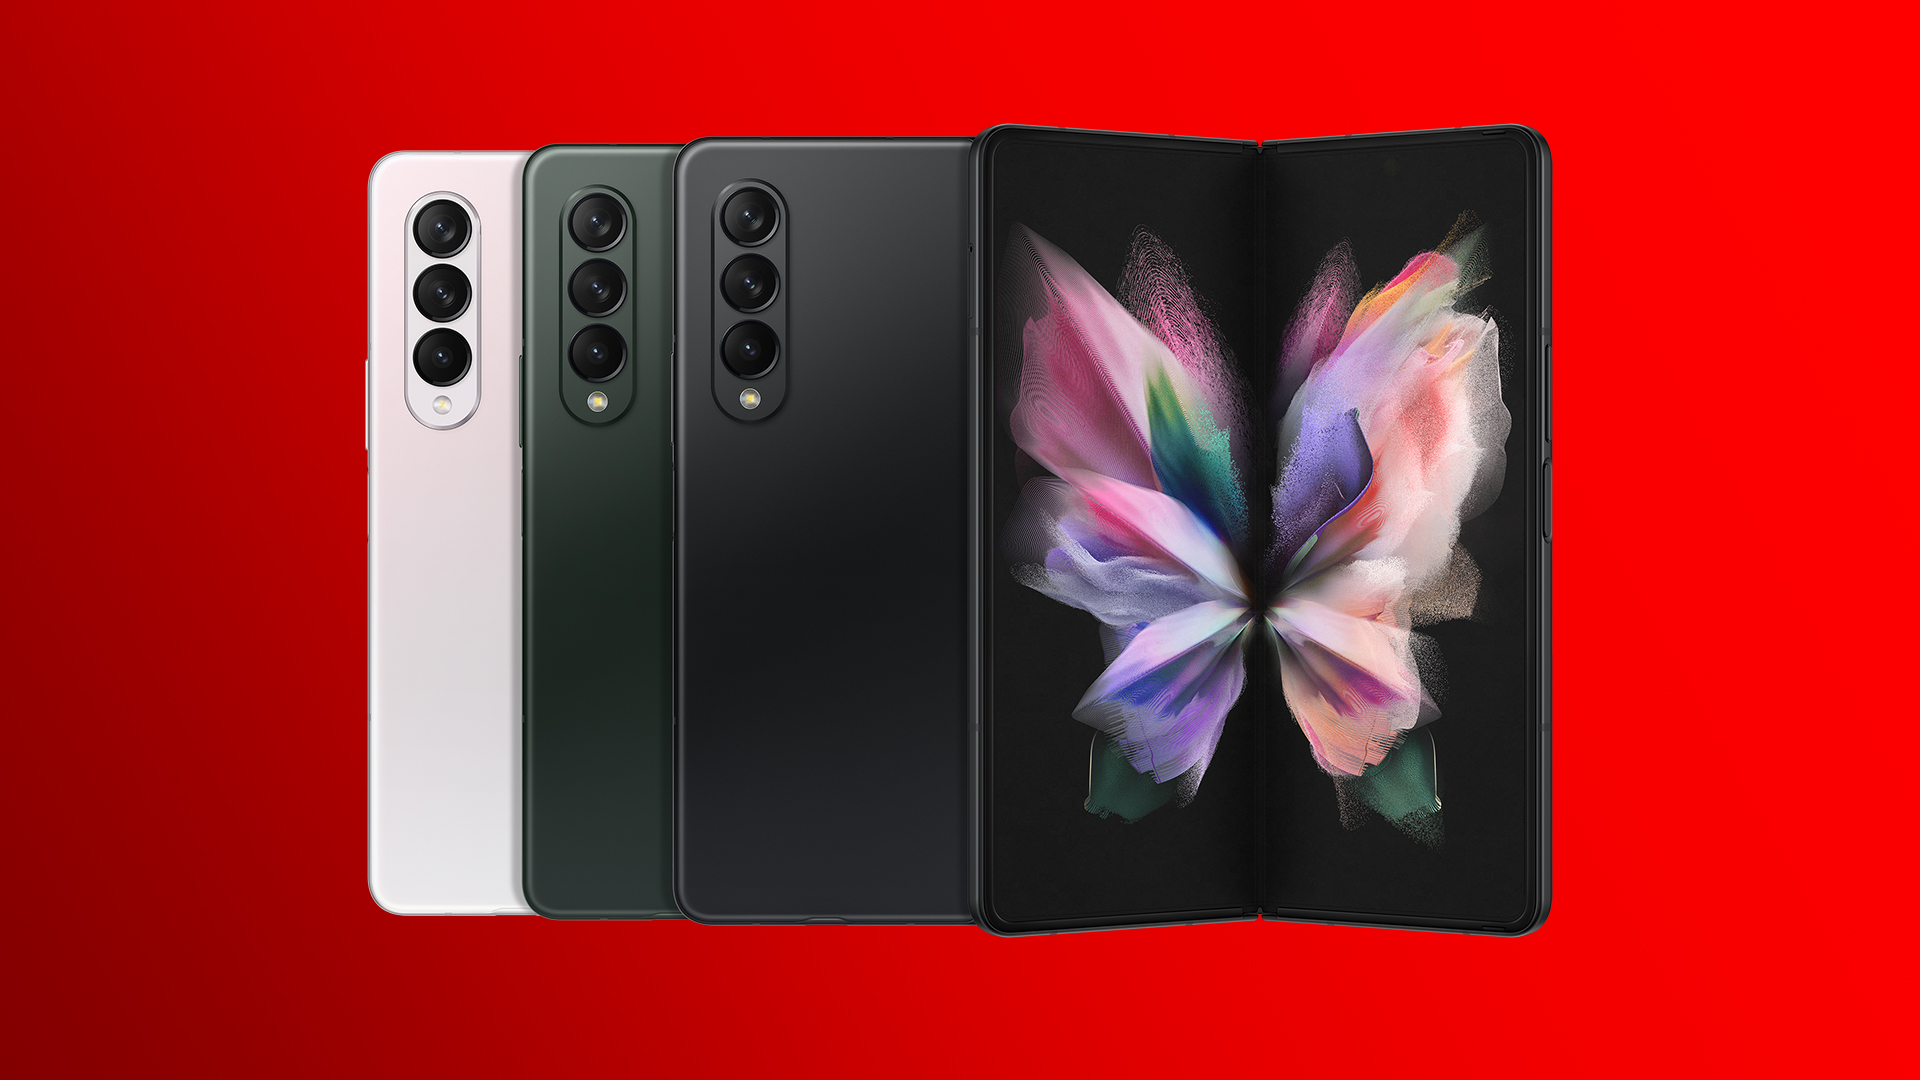 Das Samsung Galaxy Z Fold 3 5G in den Farben Phantom Silver, Phantom Green und Phantom Black.